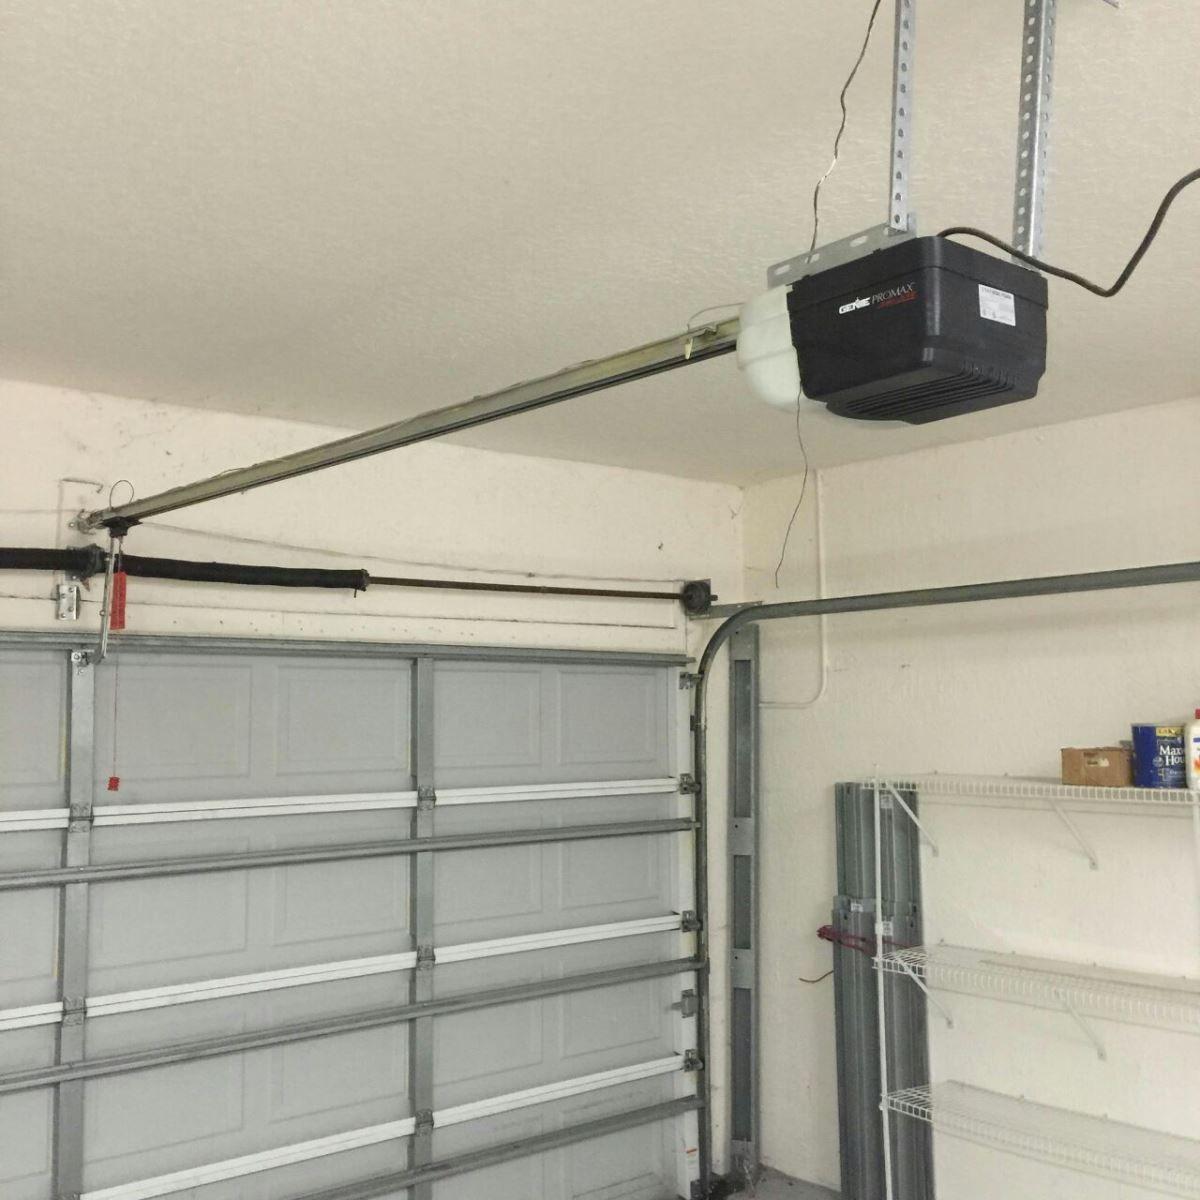 Gd Garage Door Repair Grafton Ma 508 474 5767 In 2020 Garage Door Opener Remote Best Garage Door Opener Garage Door Installation